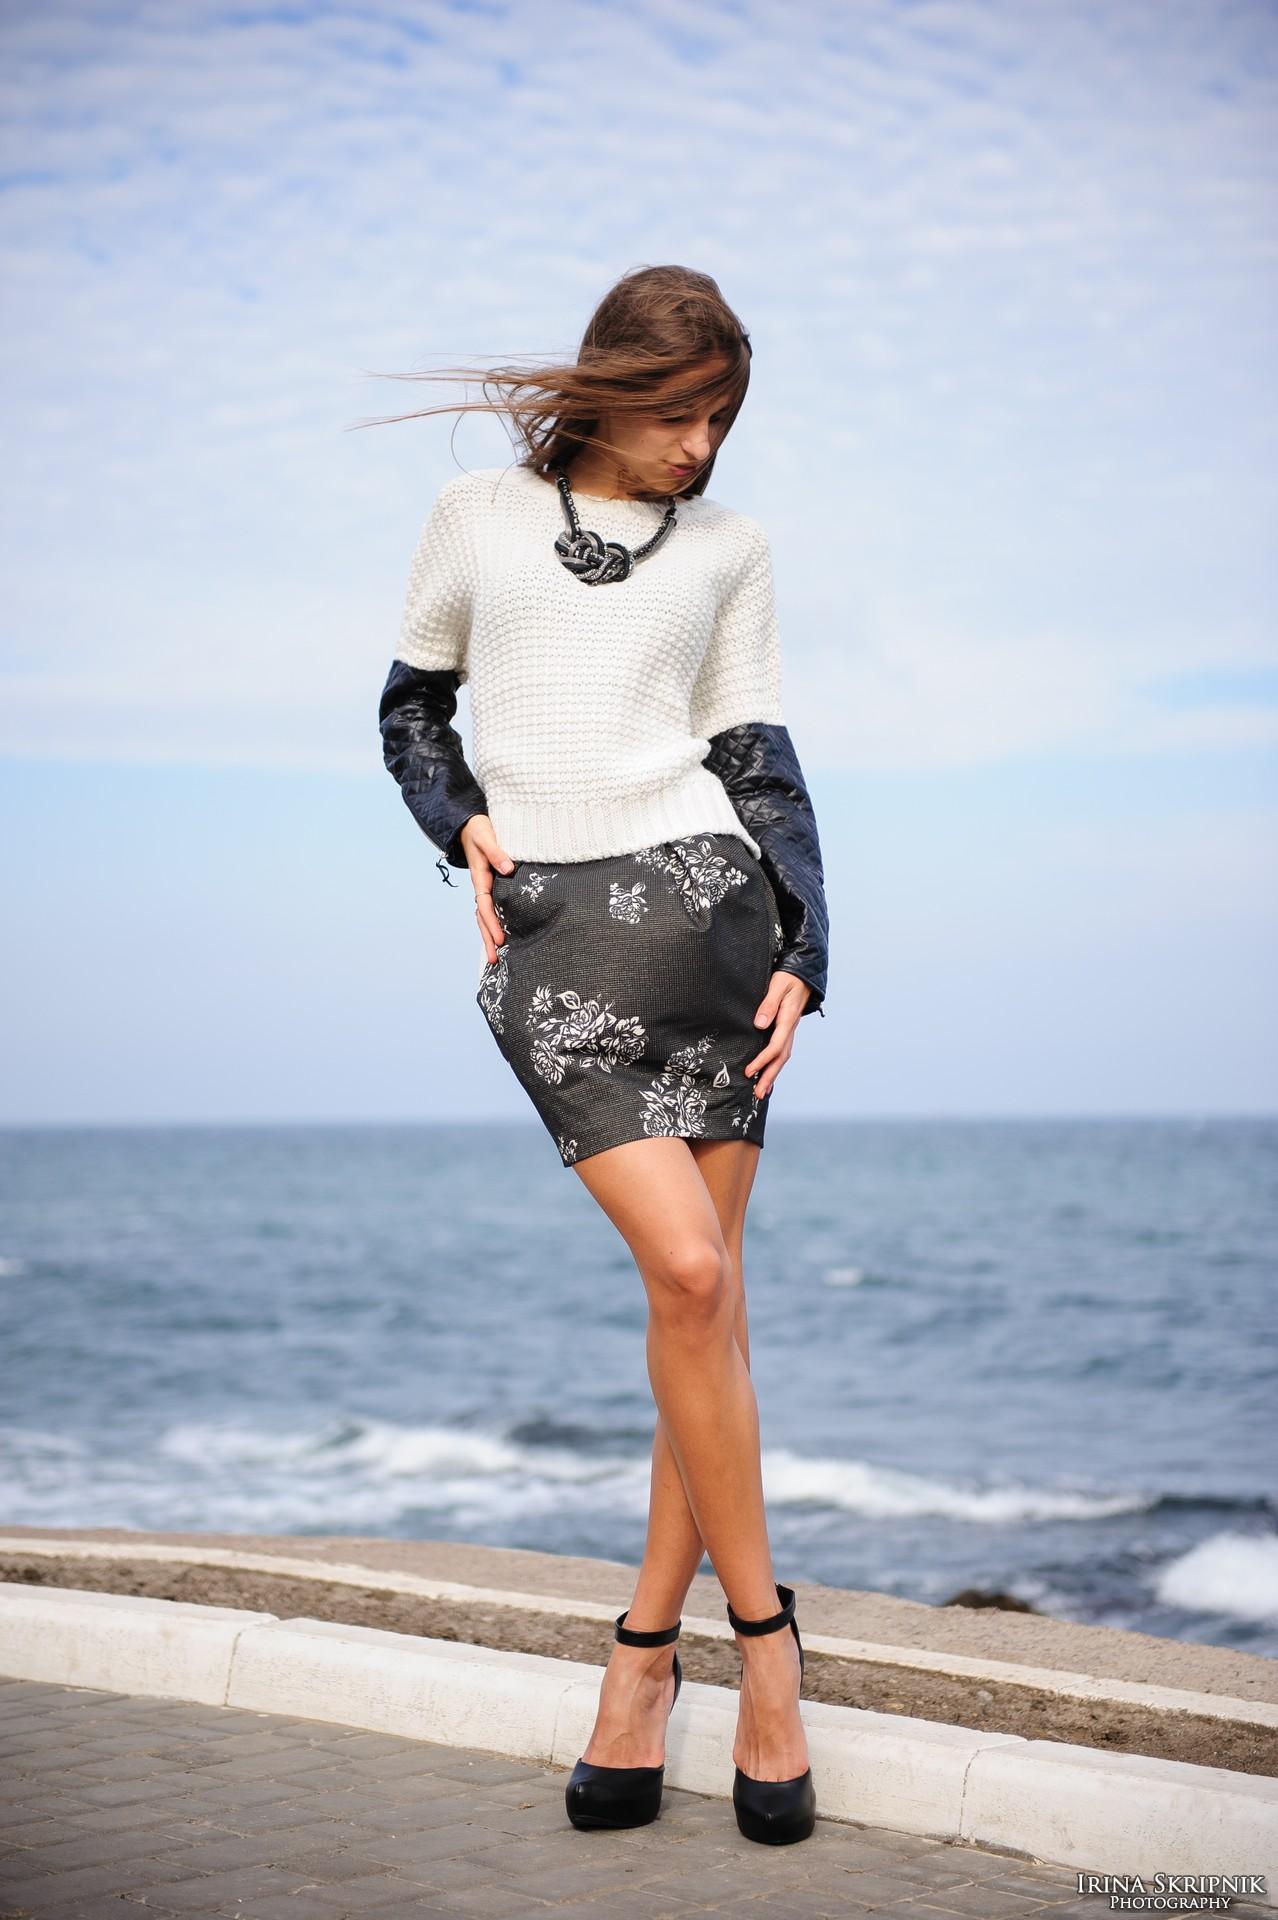 Irina Skripnik Photography 30050